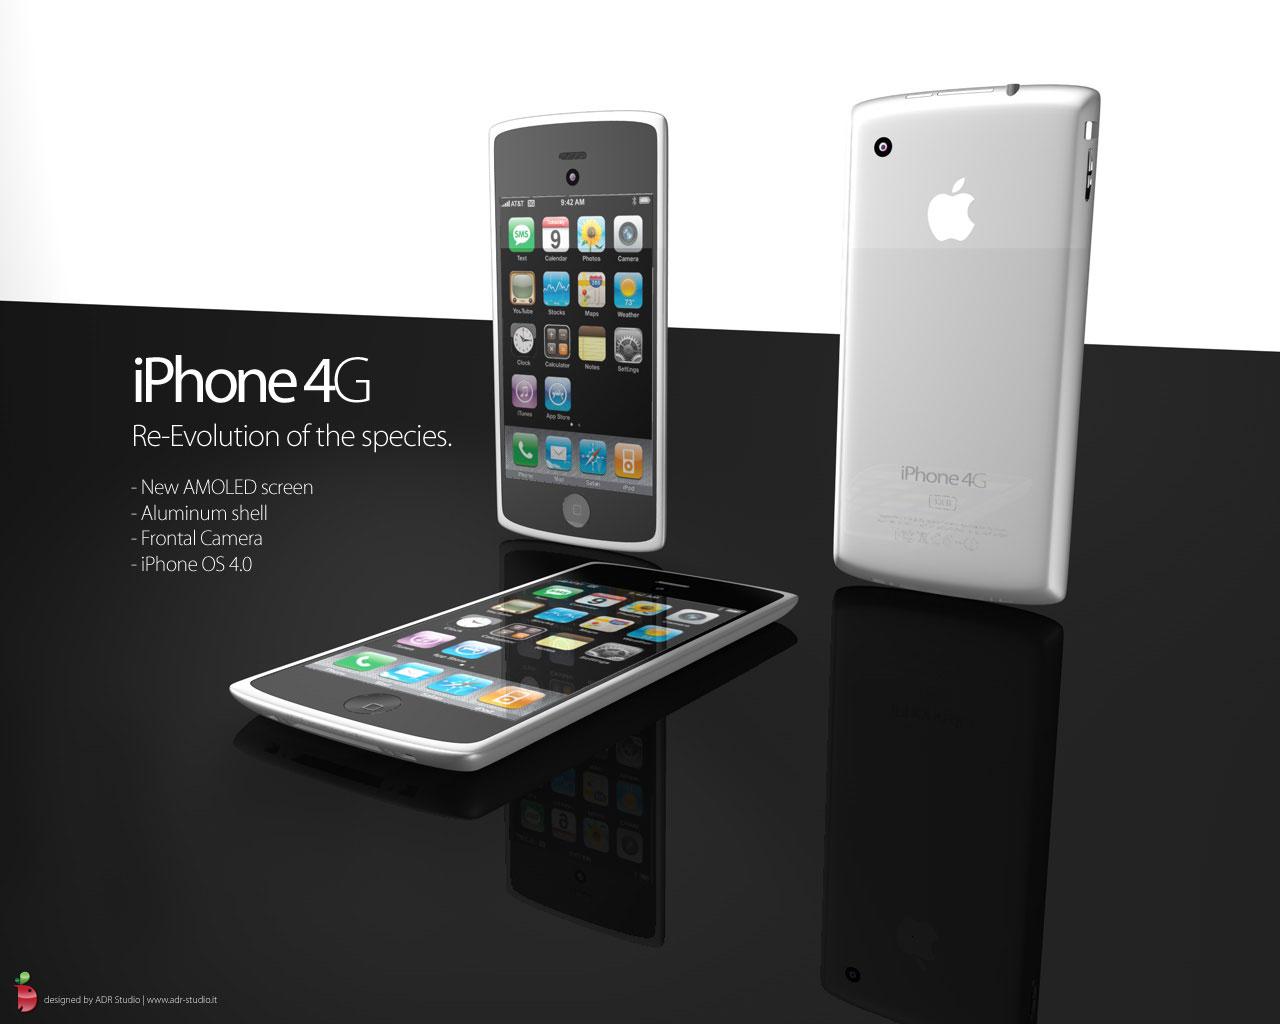 adr studio iphone 4g konzept iphone news die neuesten. Black Bedroom Furniture Sets. Home Design Ideas